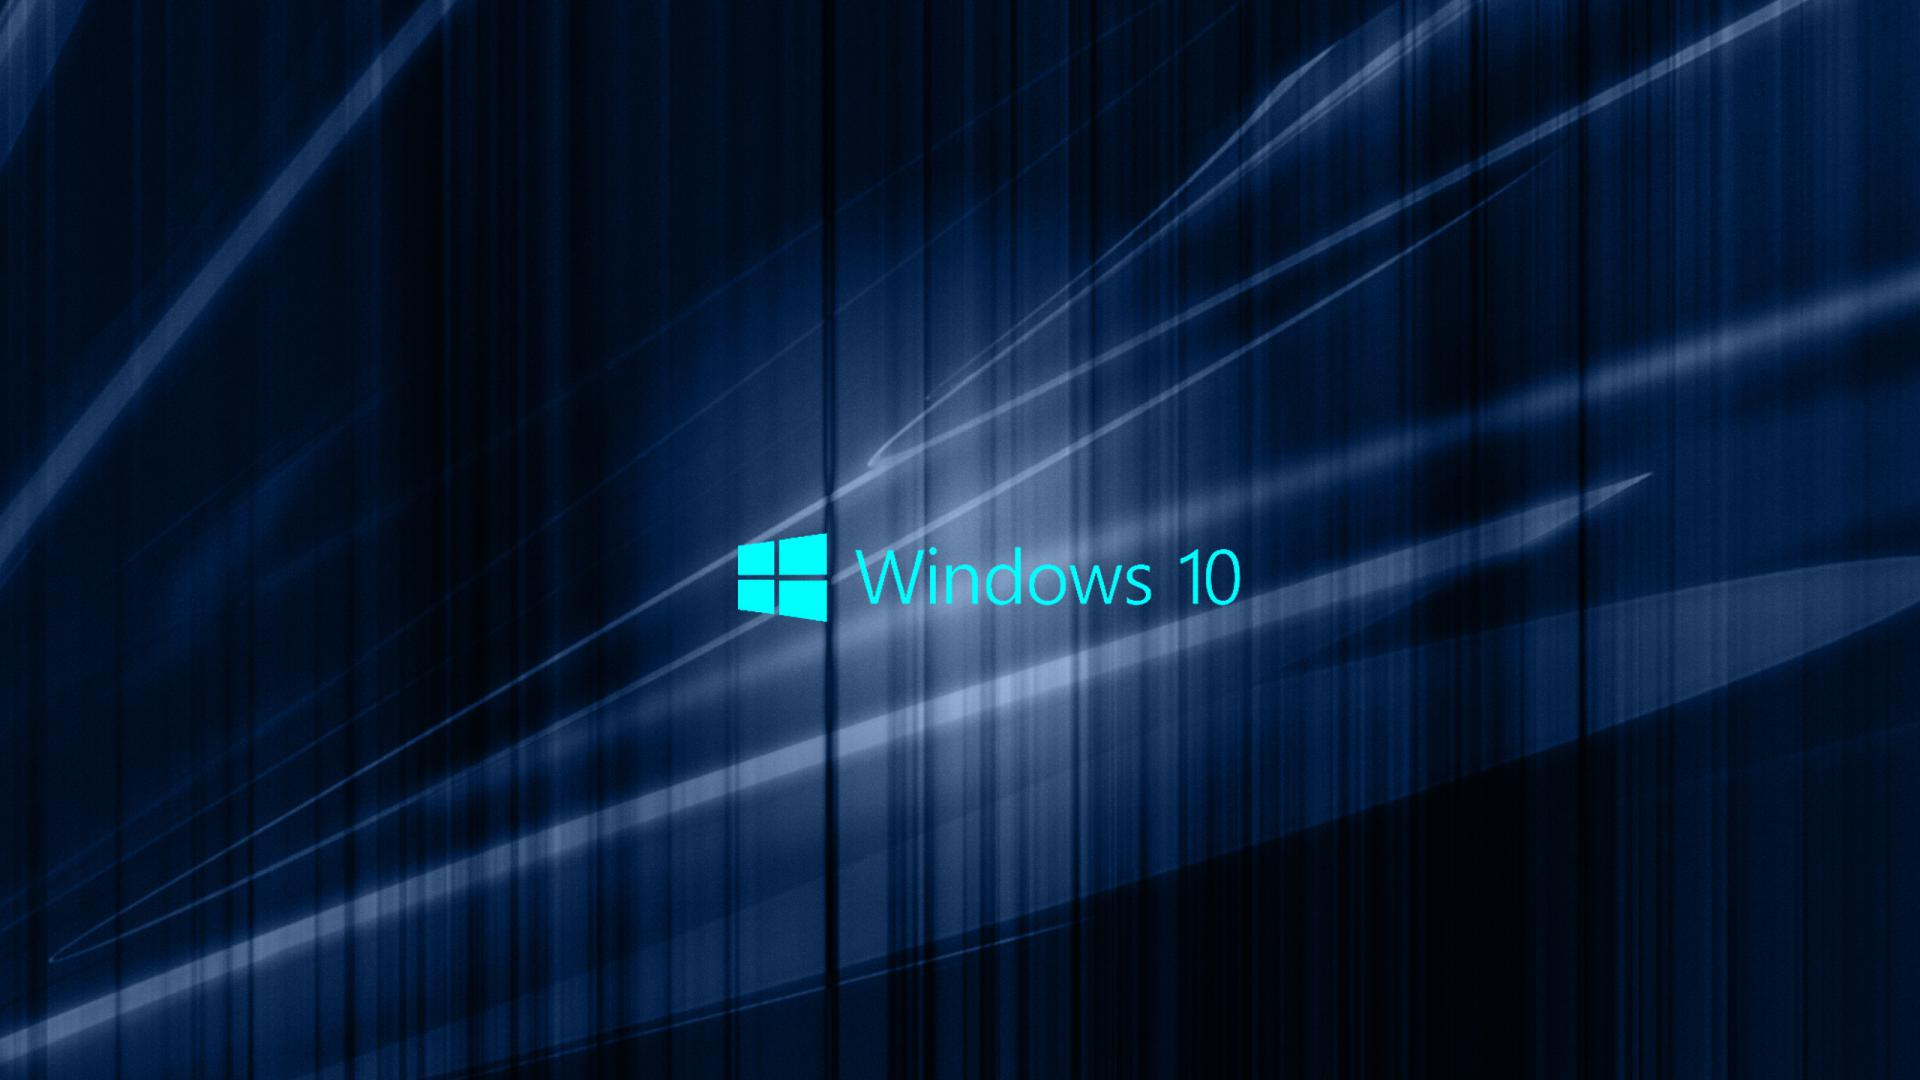 wallpaper for laptop windows 10,blue,text,light,line,electric blue